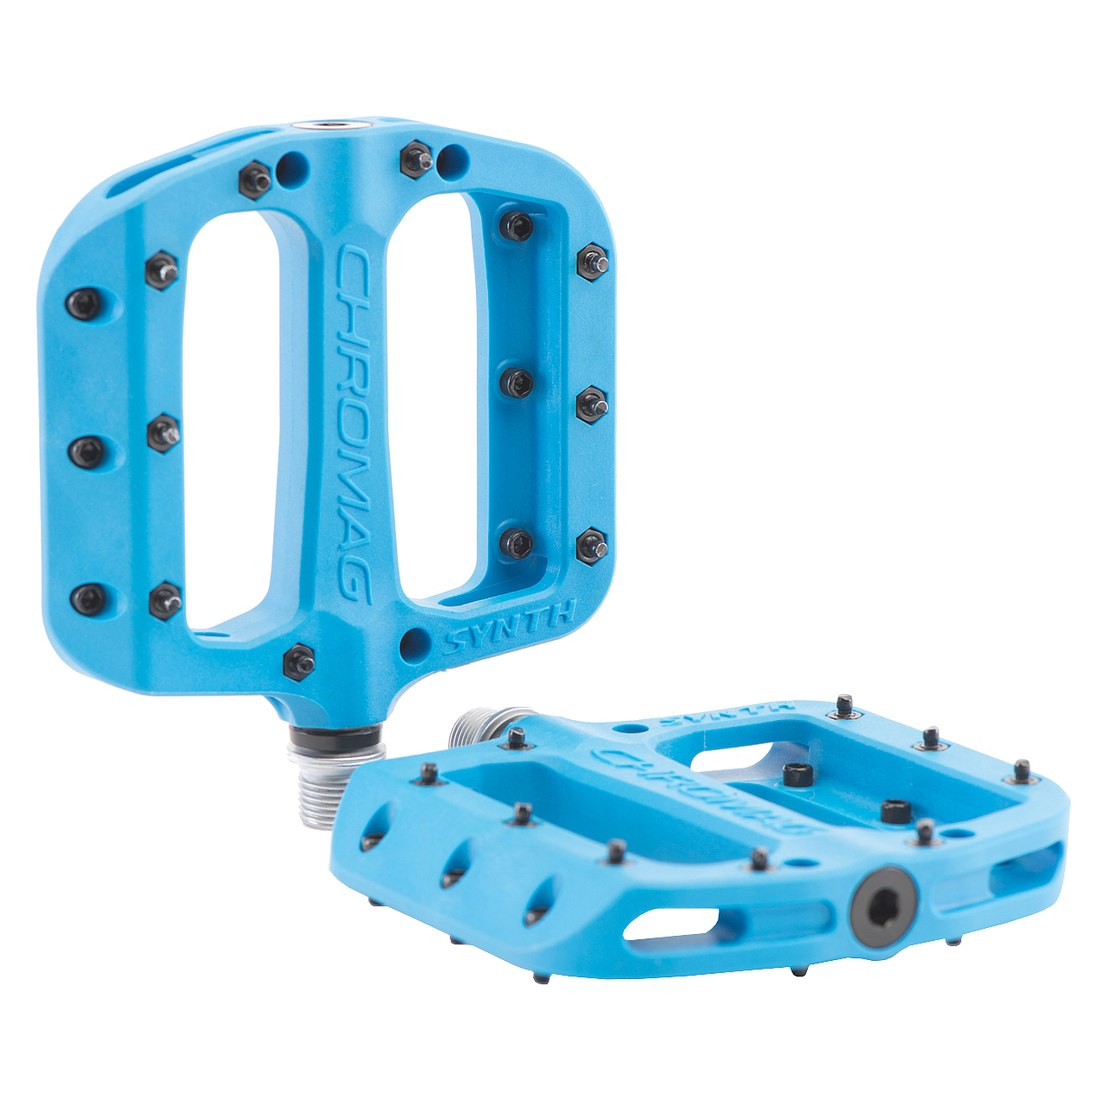 CHROMAG Synth Pedal - blue